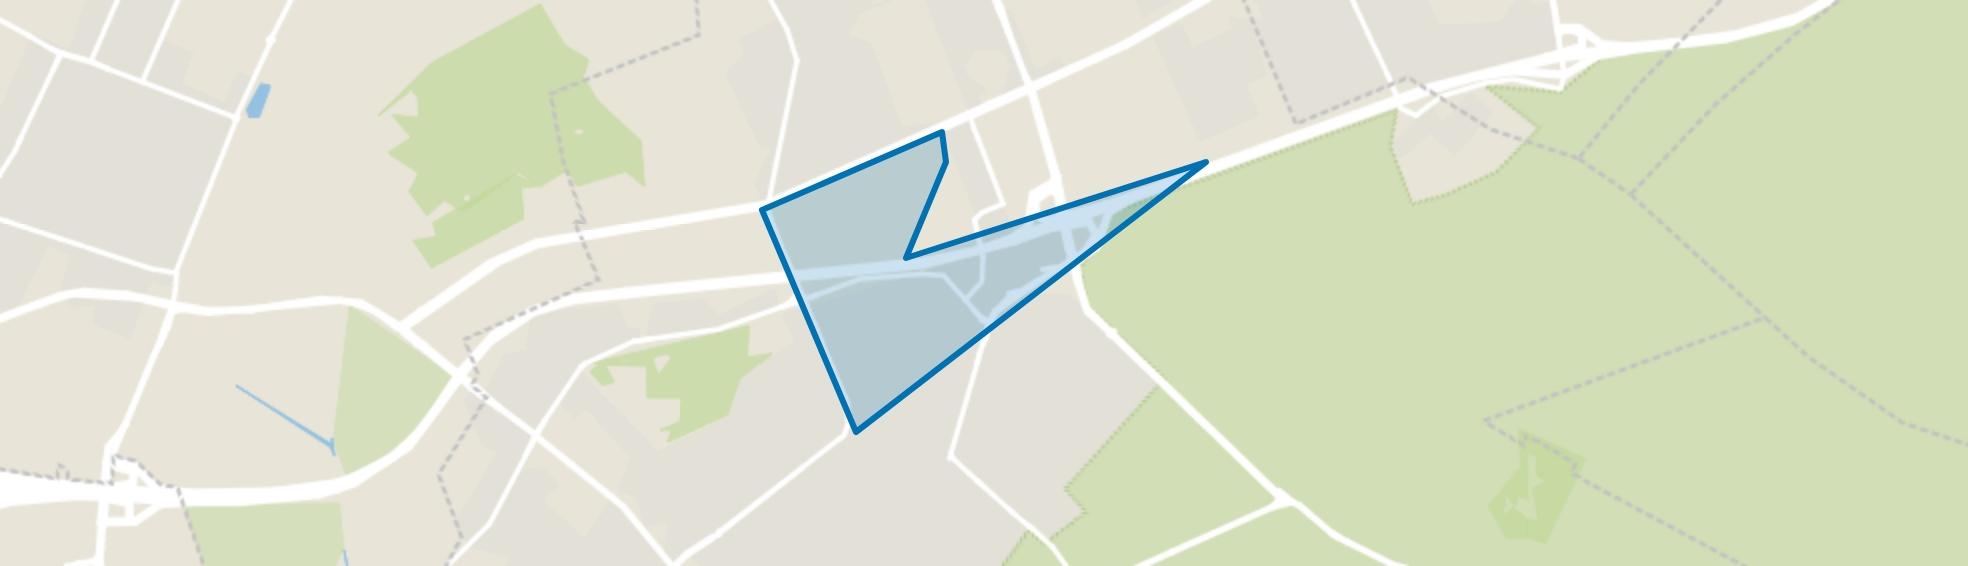 Dijnselburg, Zeist map